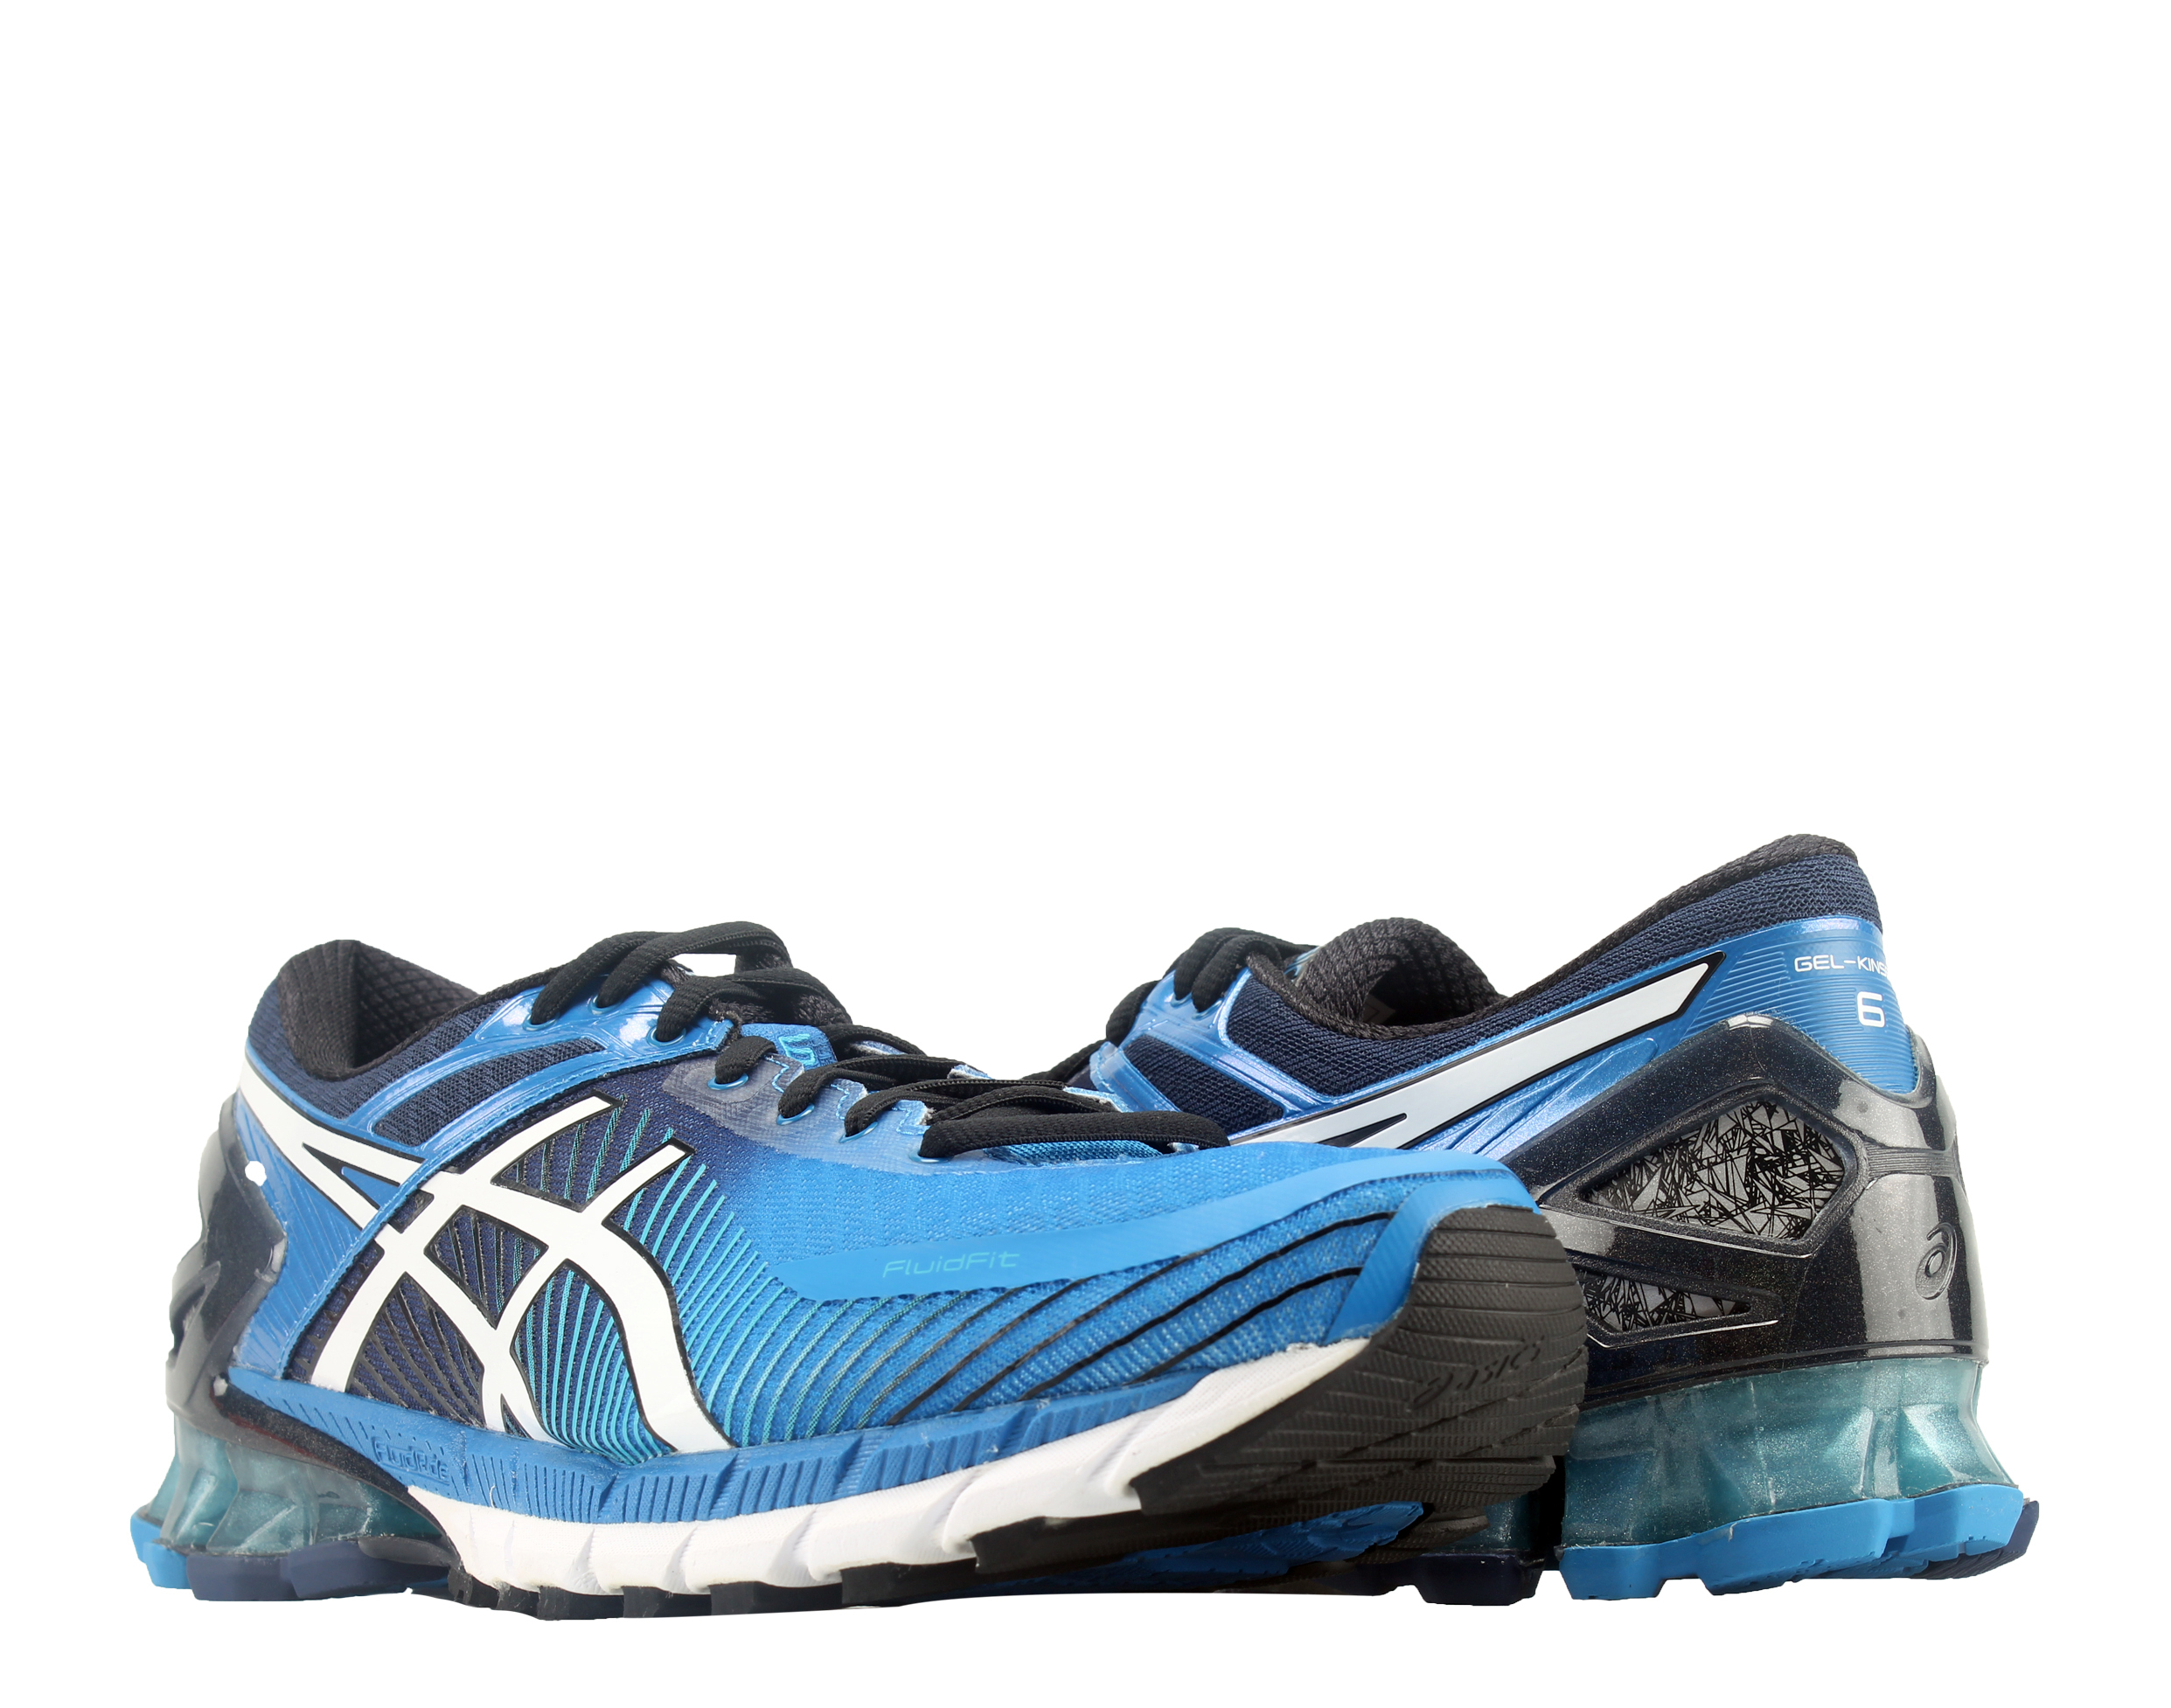 Asics Gel-Kensei 6 Electric Blue White Island Men's Running Shoes T644N-4200 by Asics